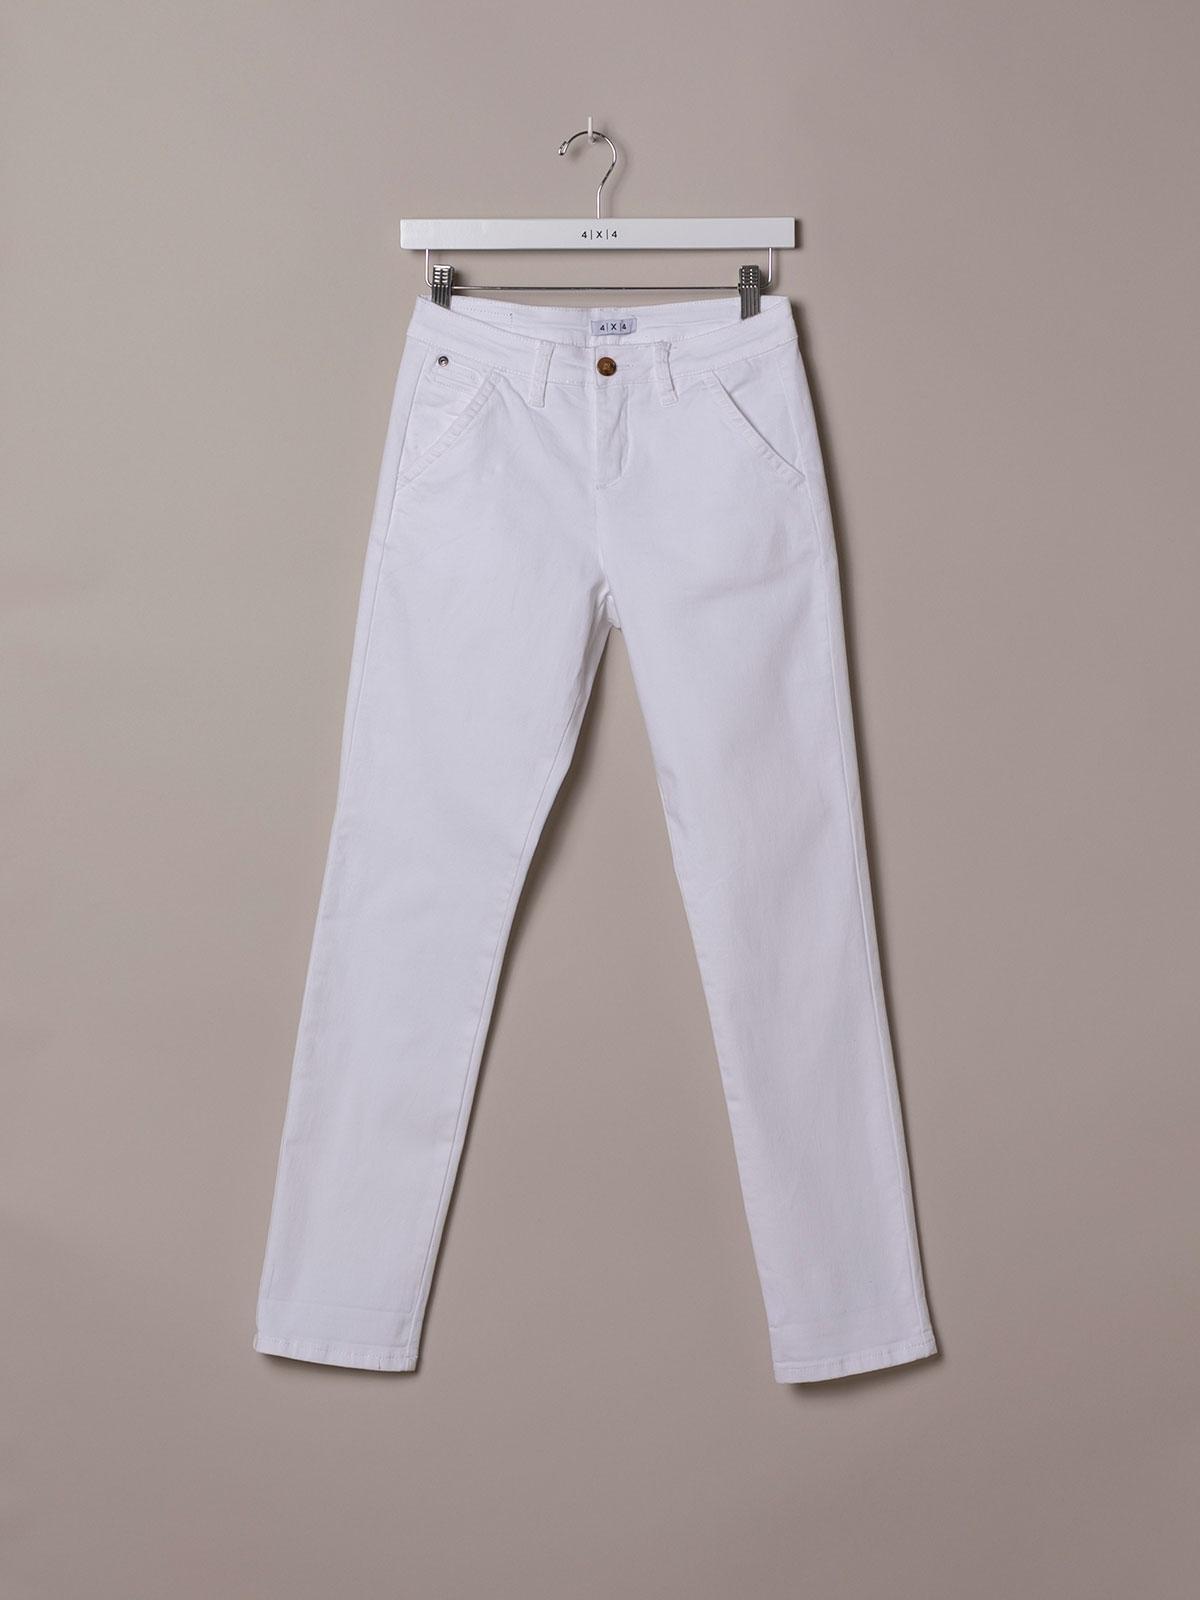 Pantalón chino mujer algodón elastico Blanco